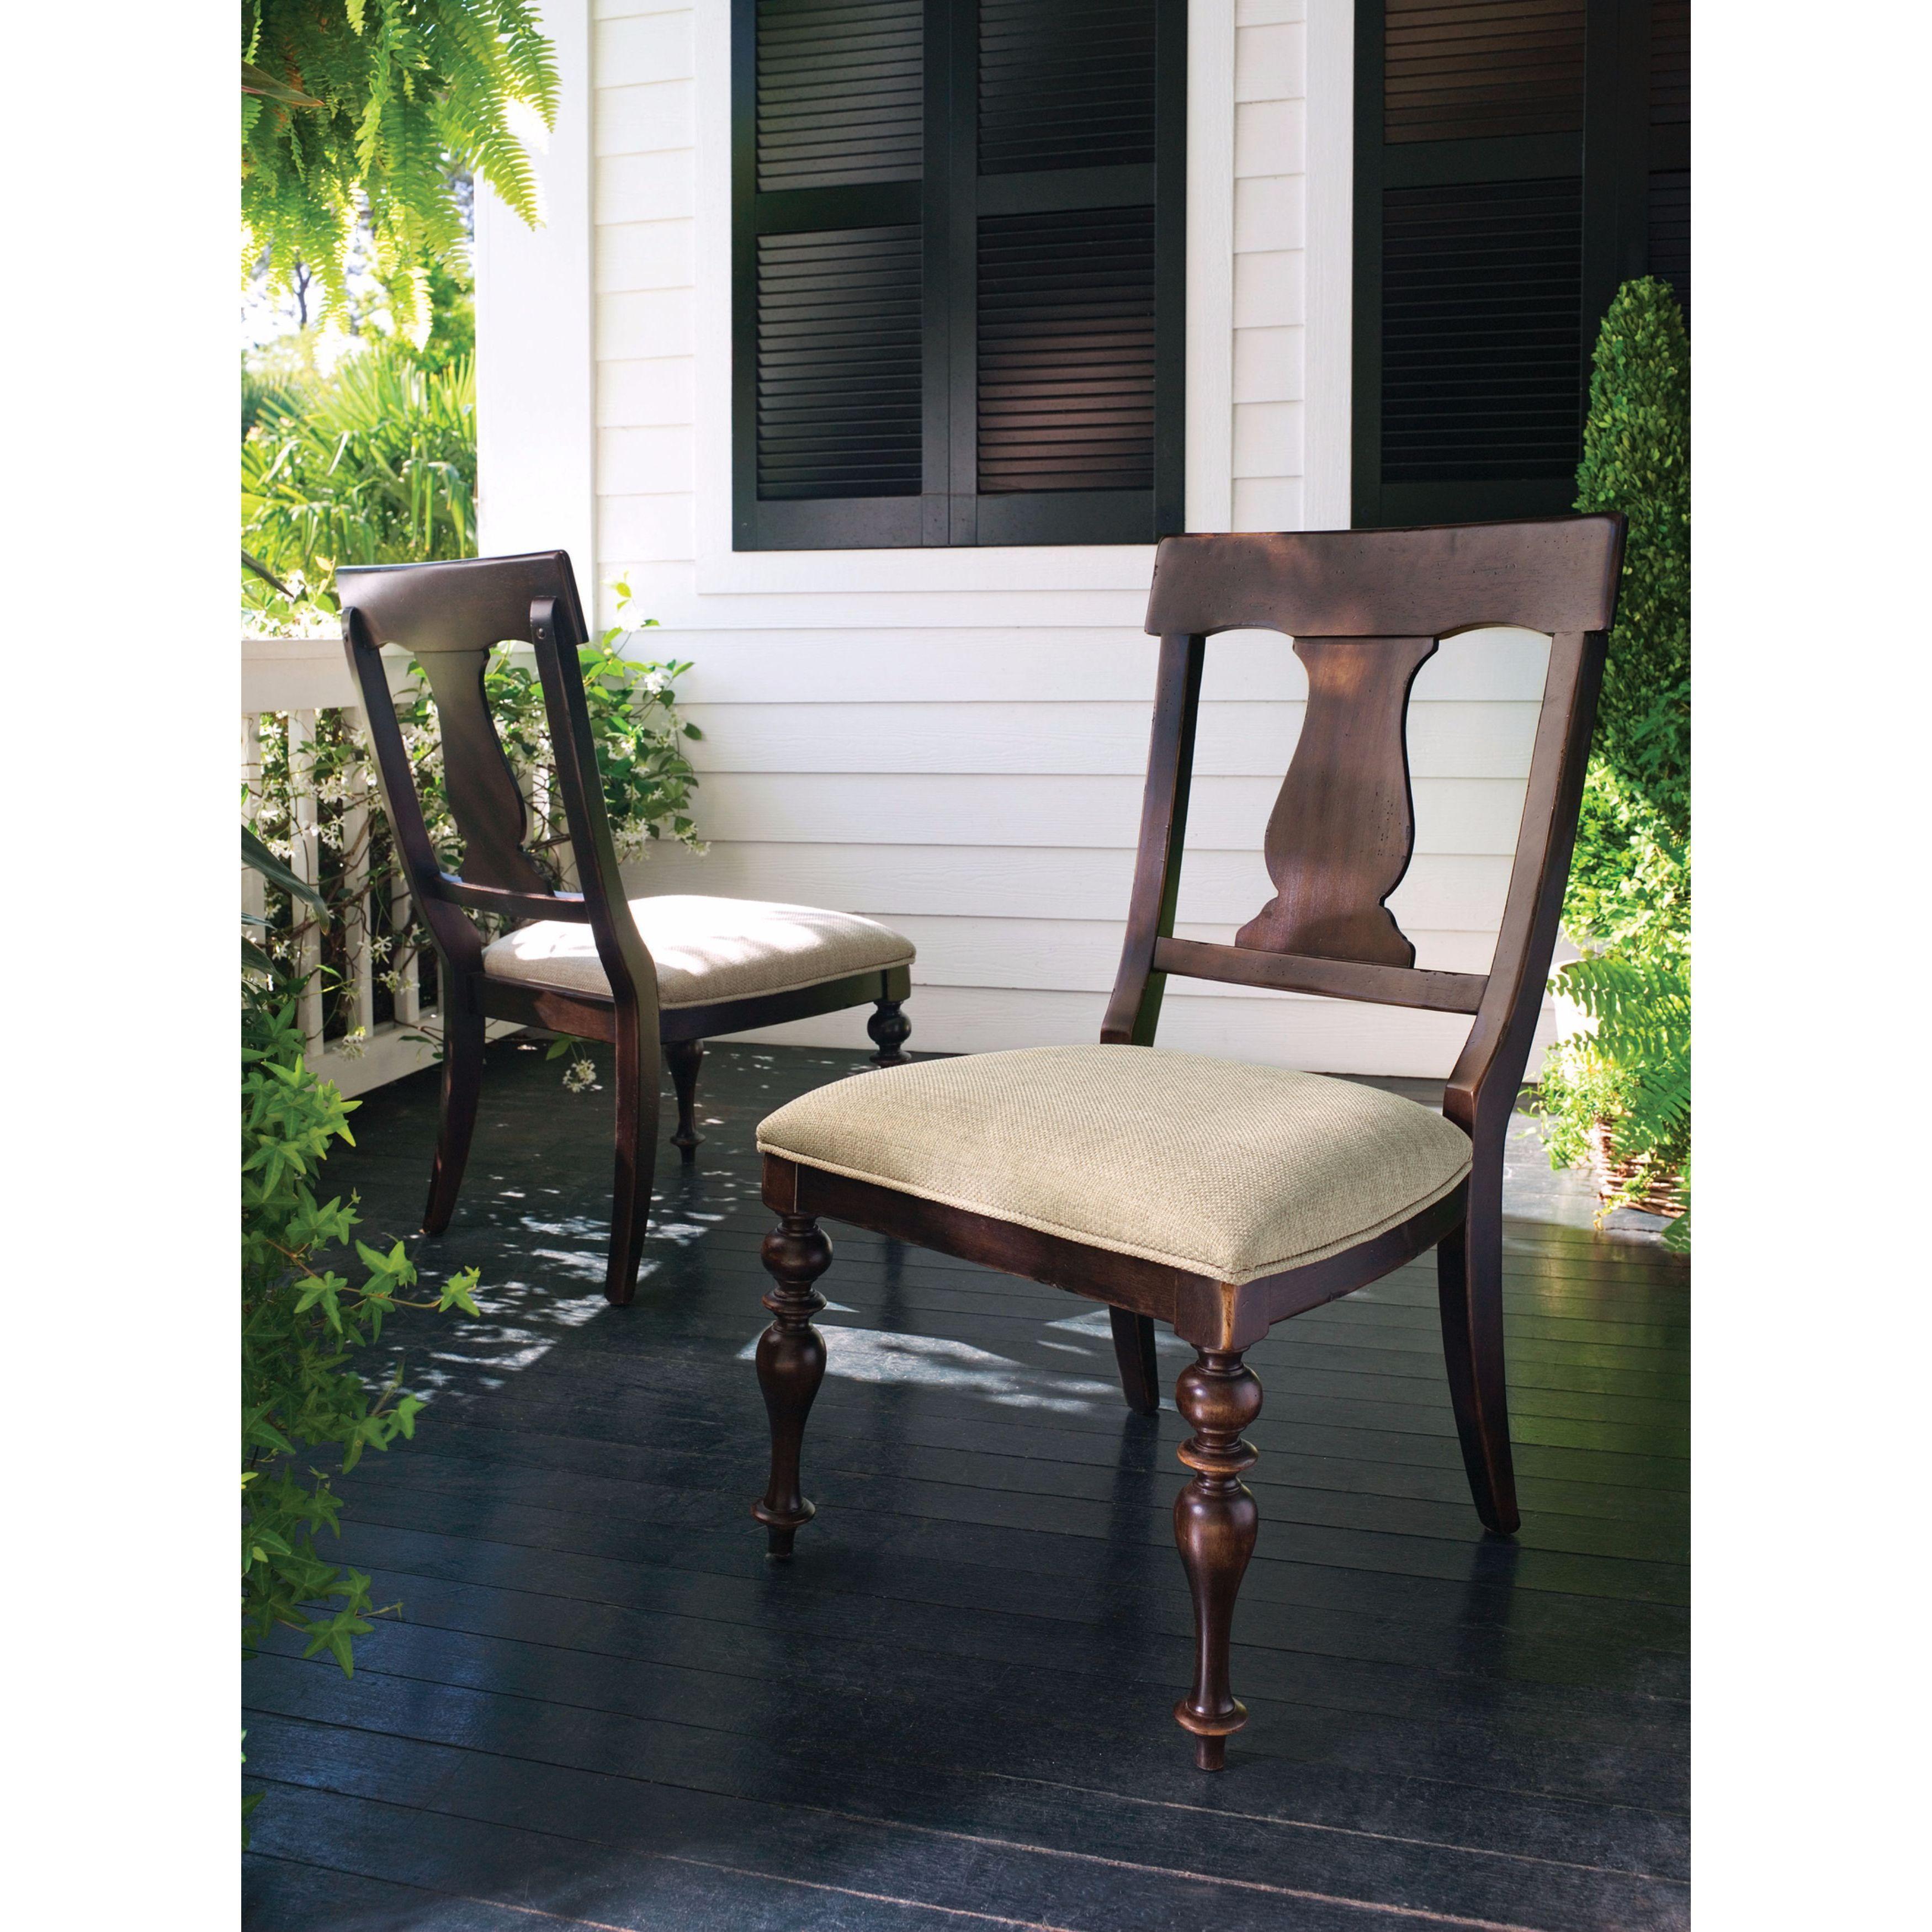 Paula Deen Home Paulau0027s Dining Chair In Tobacco Finish (Set Of 2) (Living